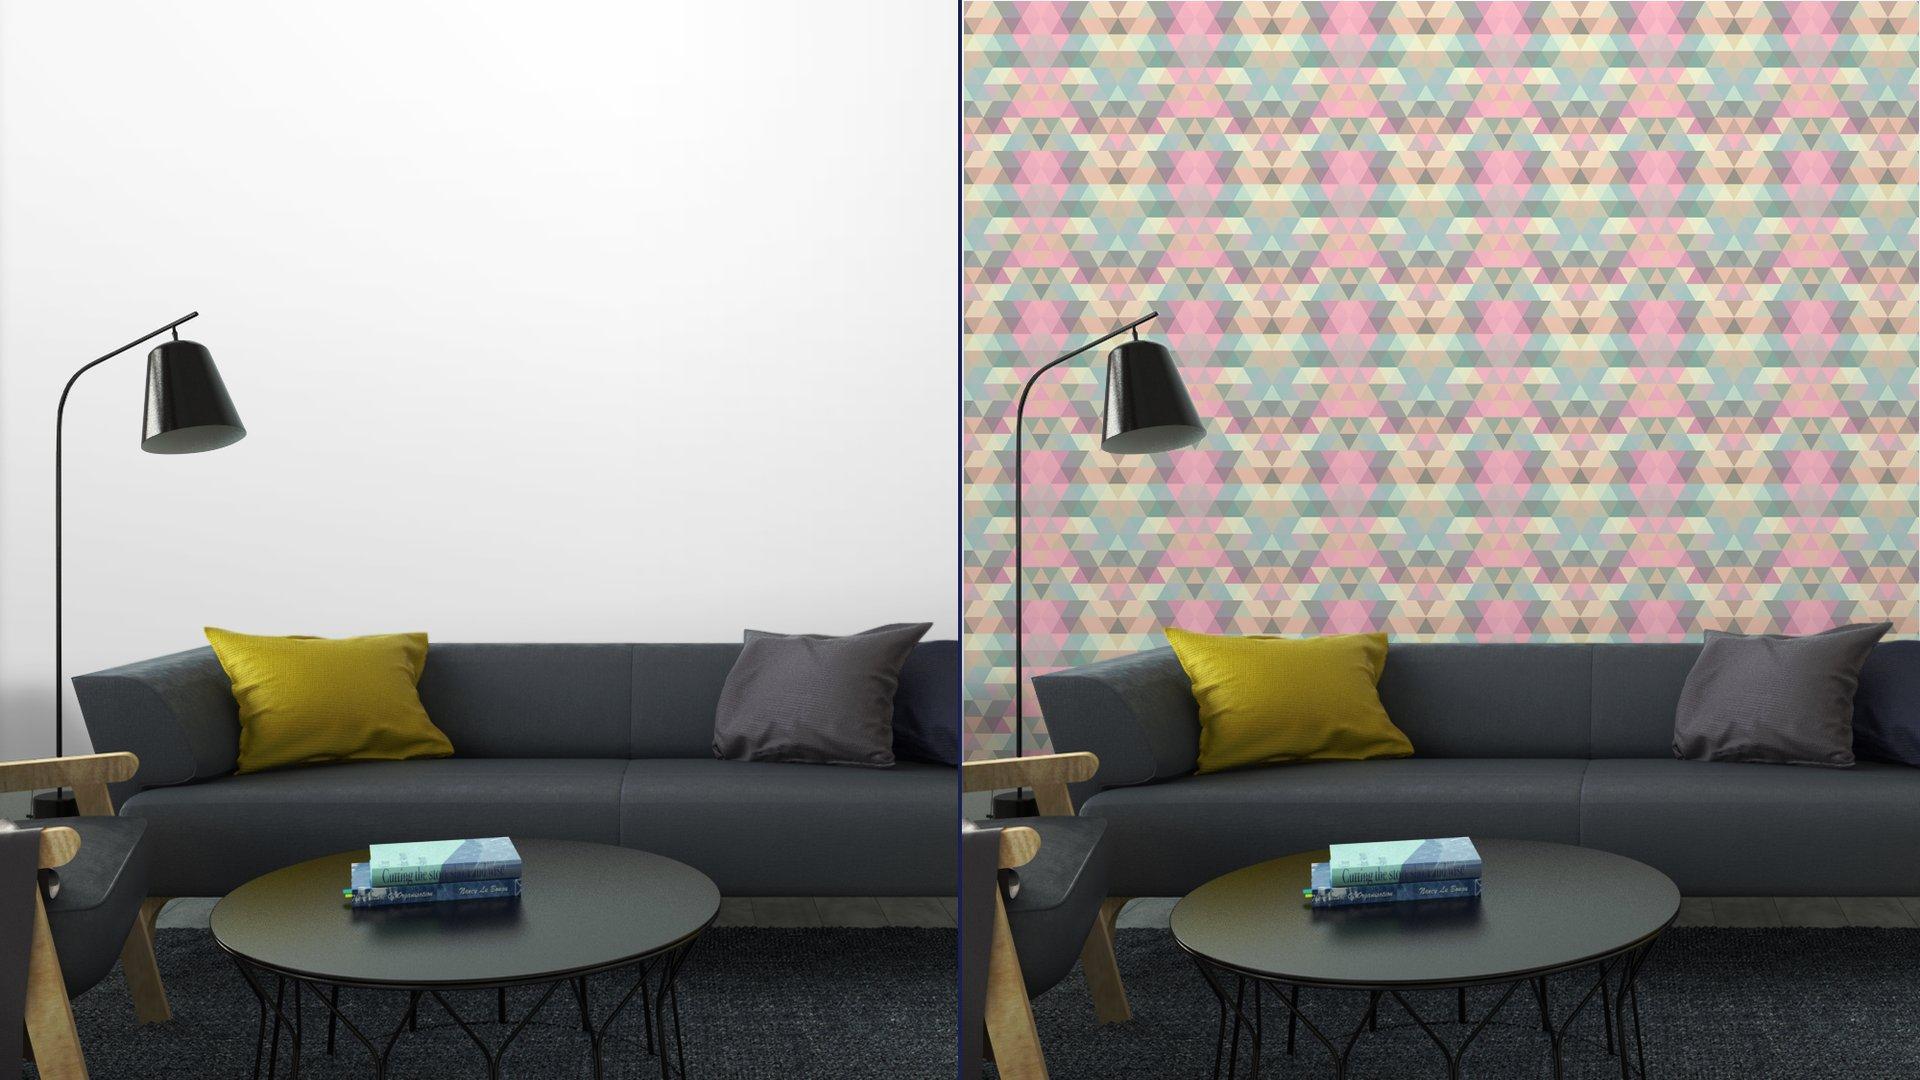 Fotomurales mexico papeles pintados lavables triangulo fondo de mosaico fondo geometrico 6 - Papel Tapiz Patrón Geométrico Triángulo 04